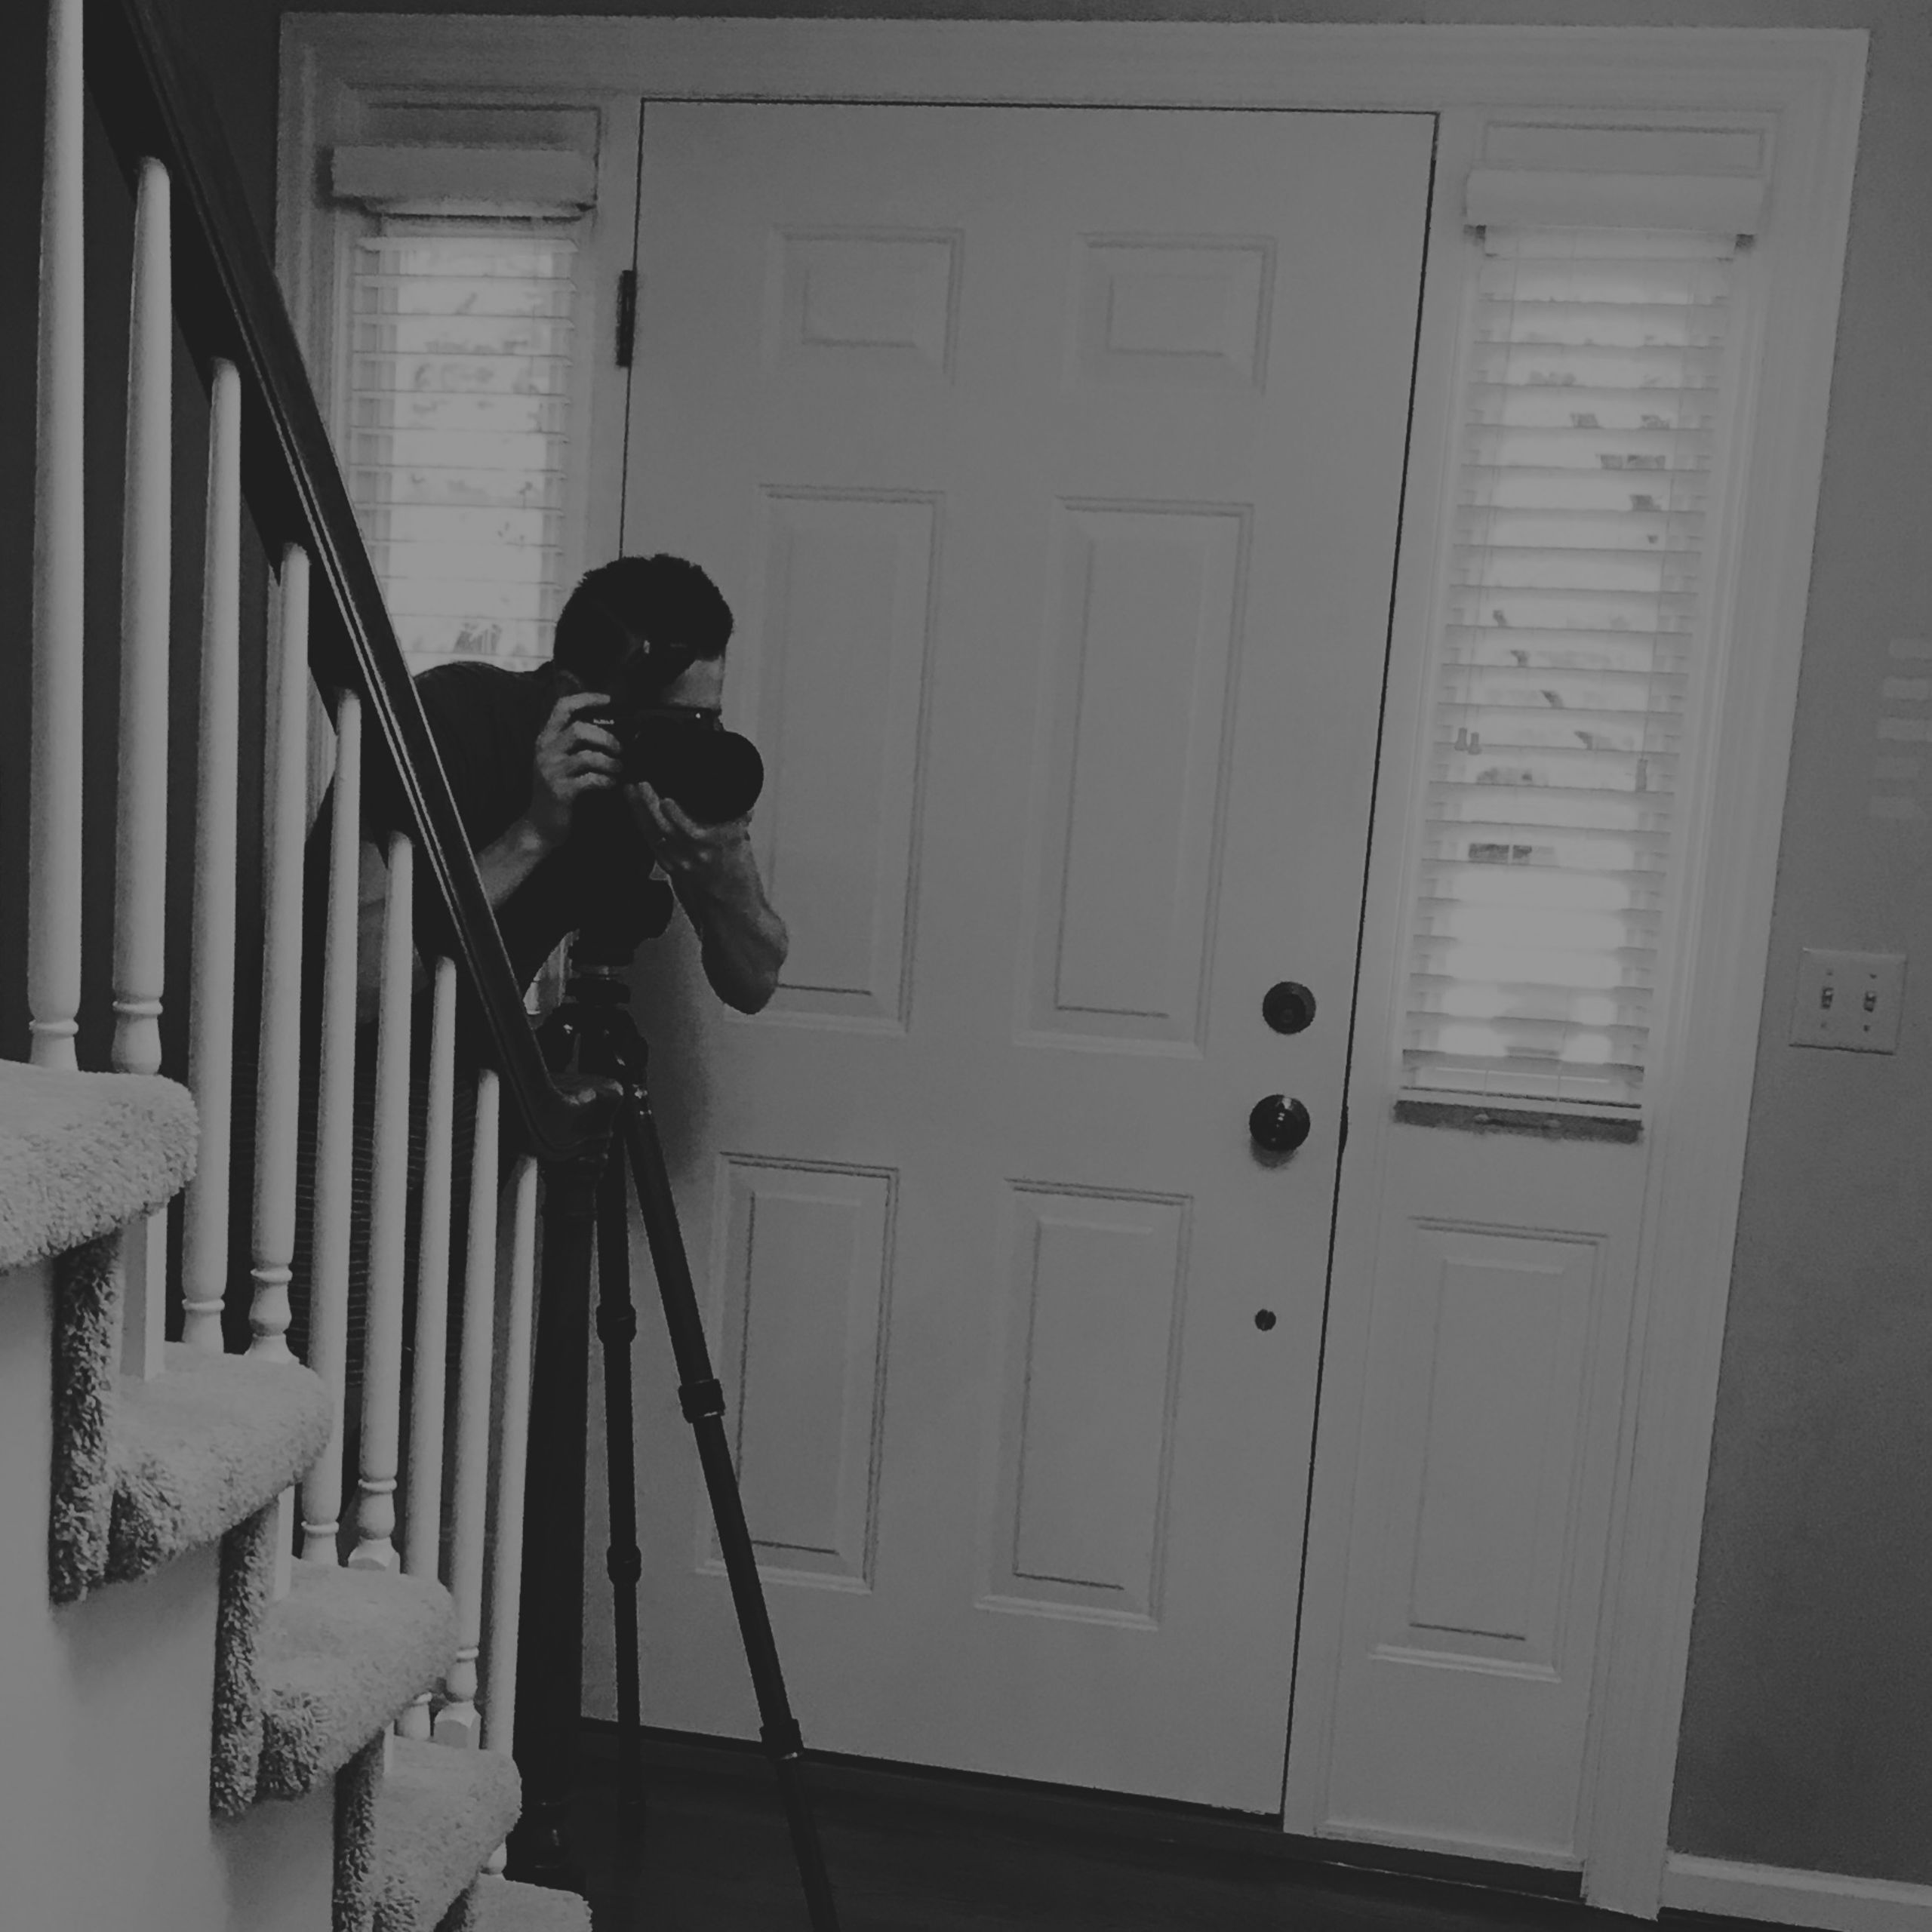 PROFESSIONAL PHOTOGRAPHY SPOTLIGHT